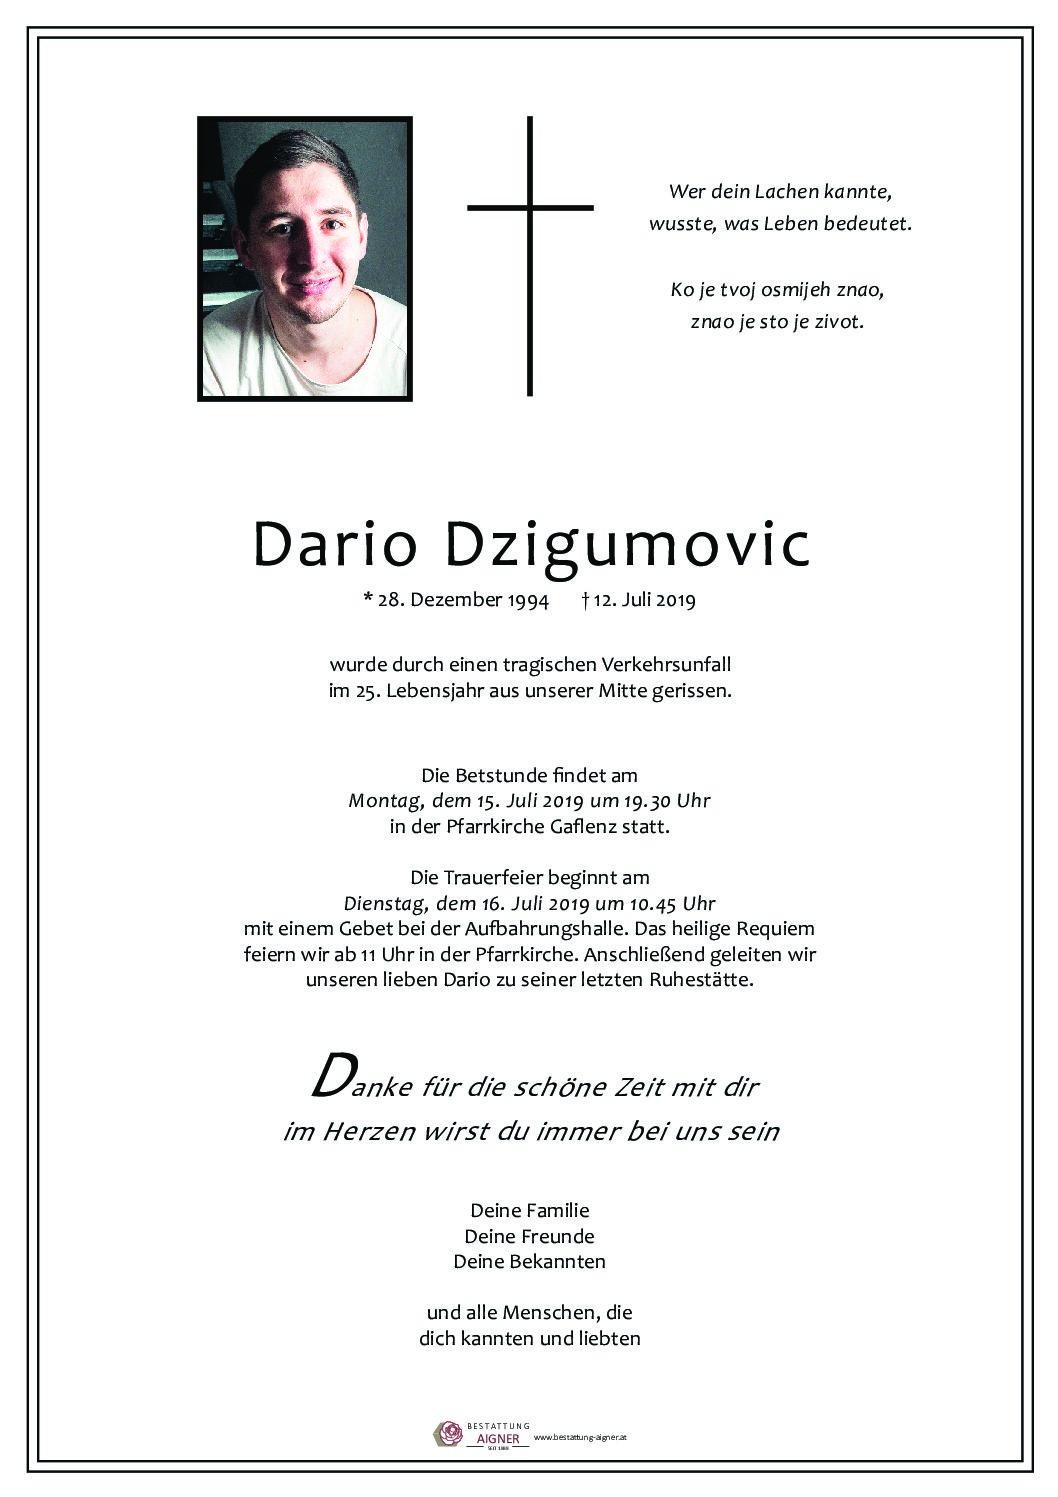 Dario Dzigumovic